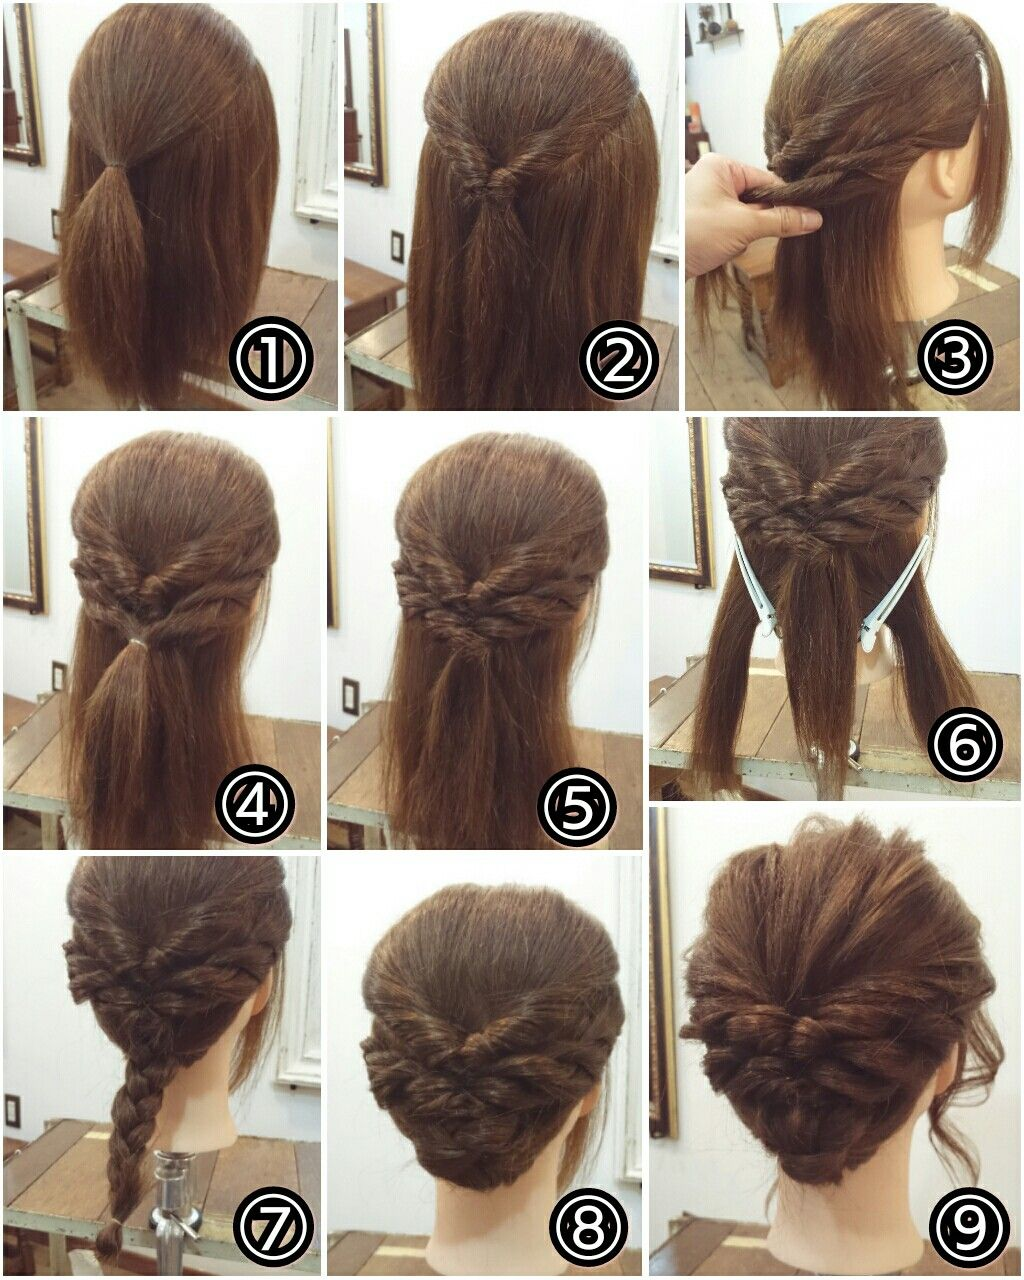 Pin by rocio maya on peinados pinterest hair style updos and